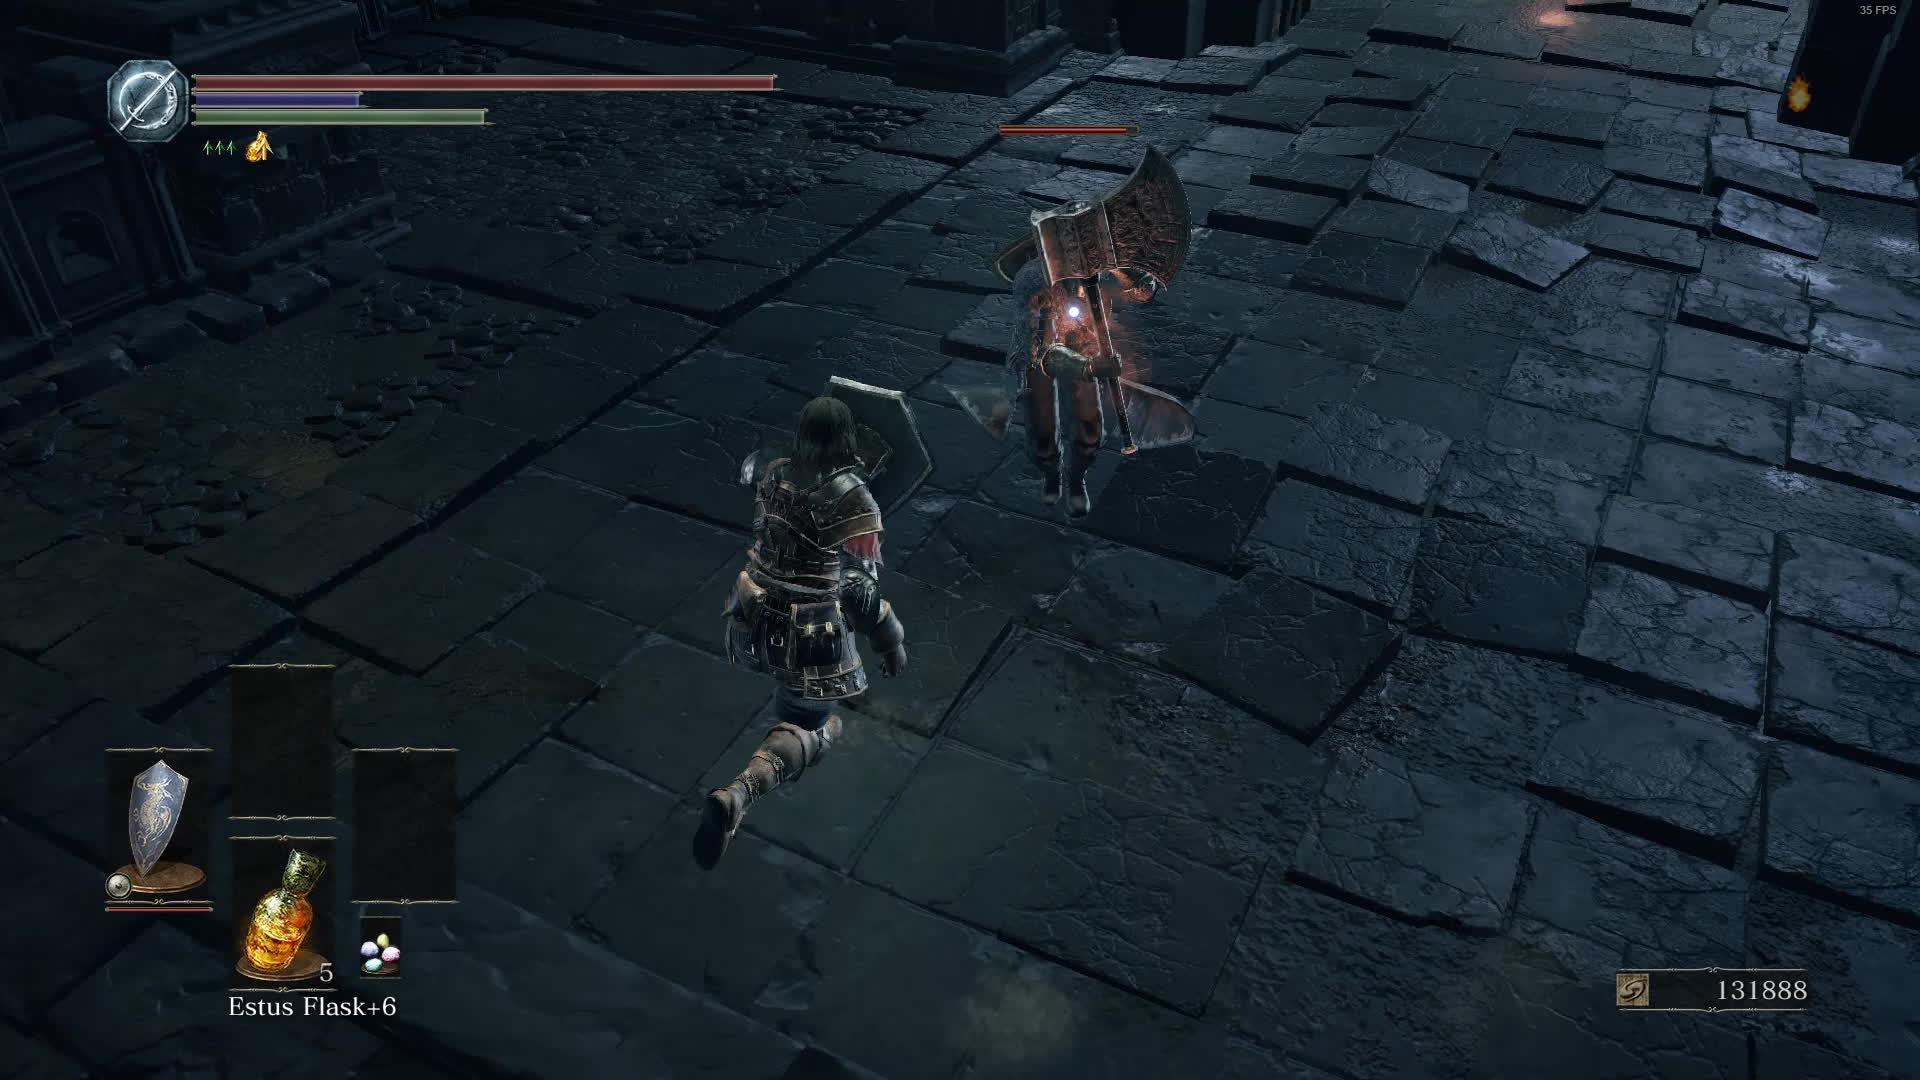 darksouls3, Dark souls 3 NPC void dash GIFs